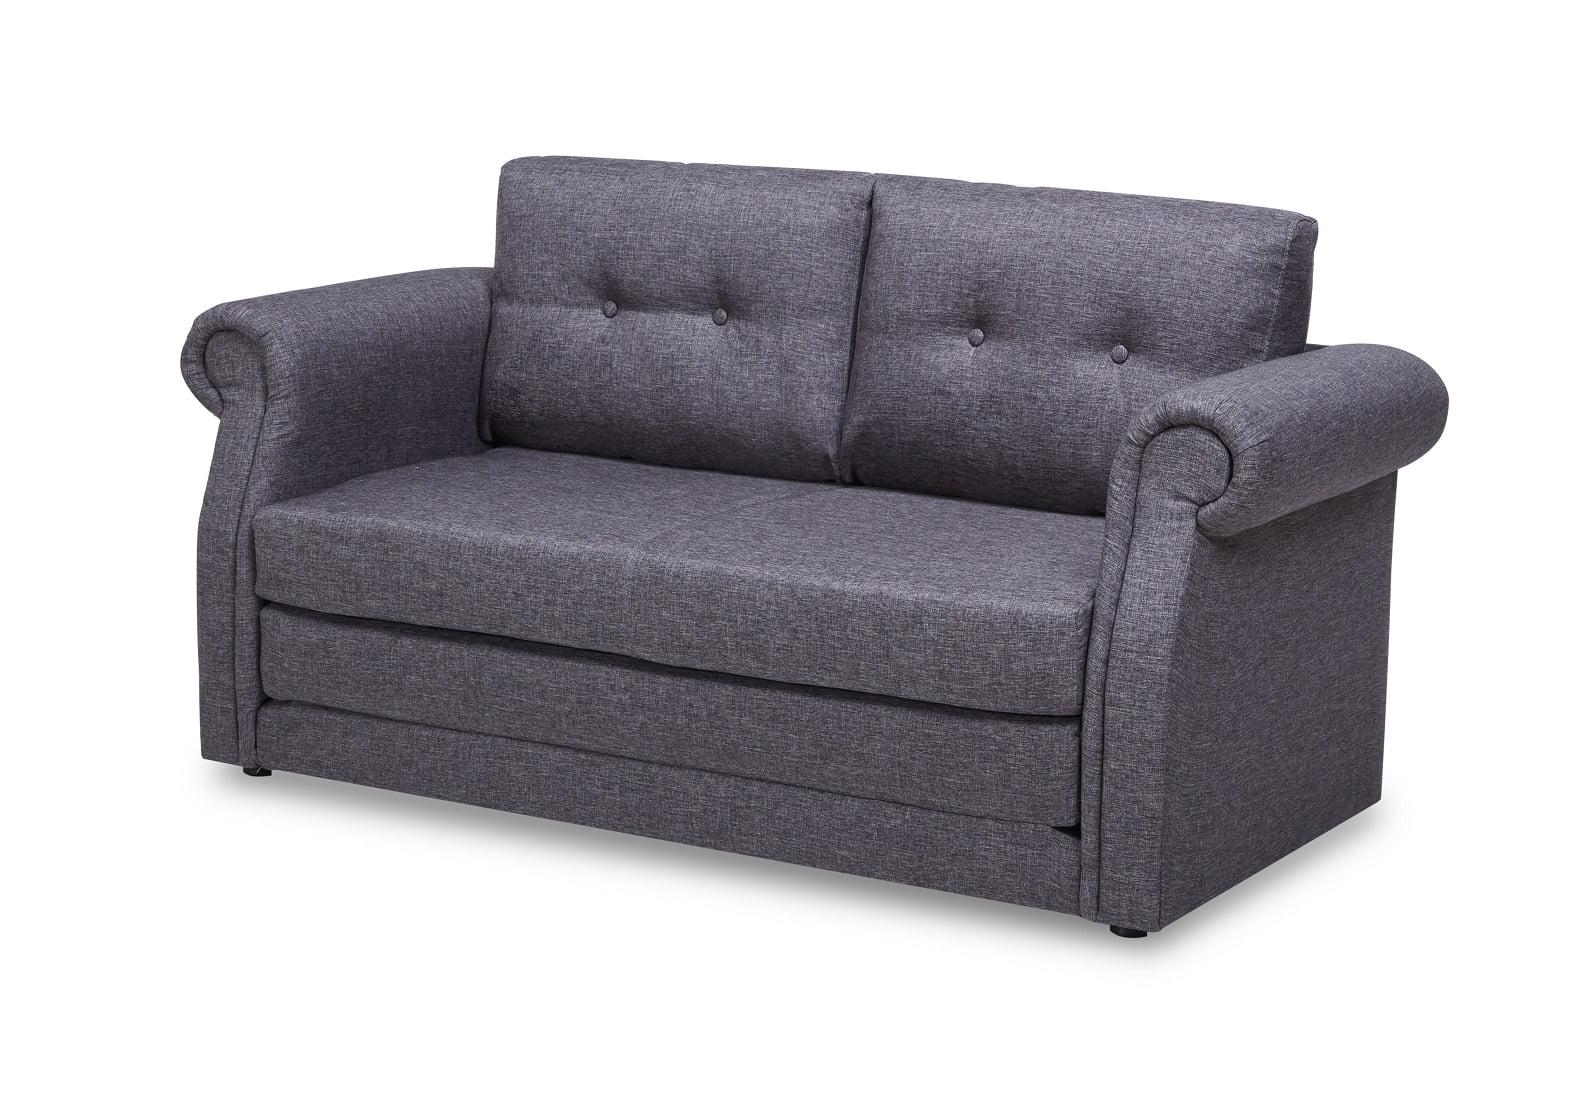 Us Pride Furniture Fabric Loveseat Sofa Bed Walmart Com